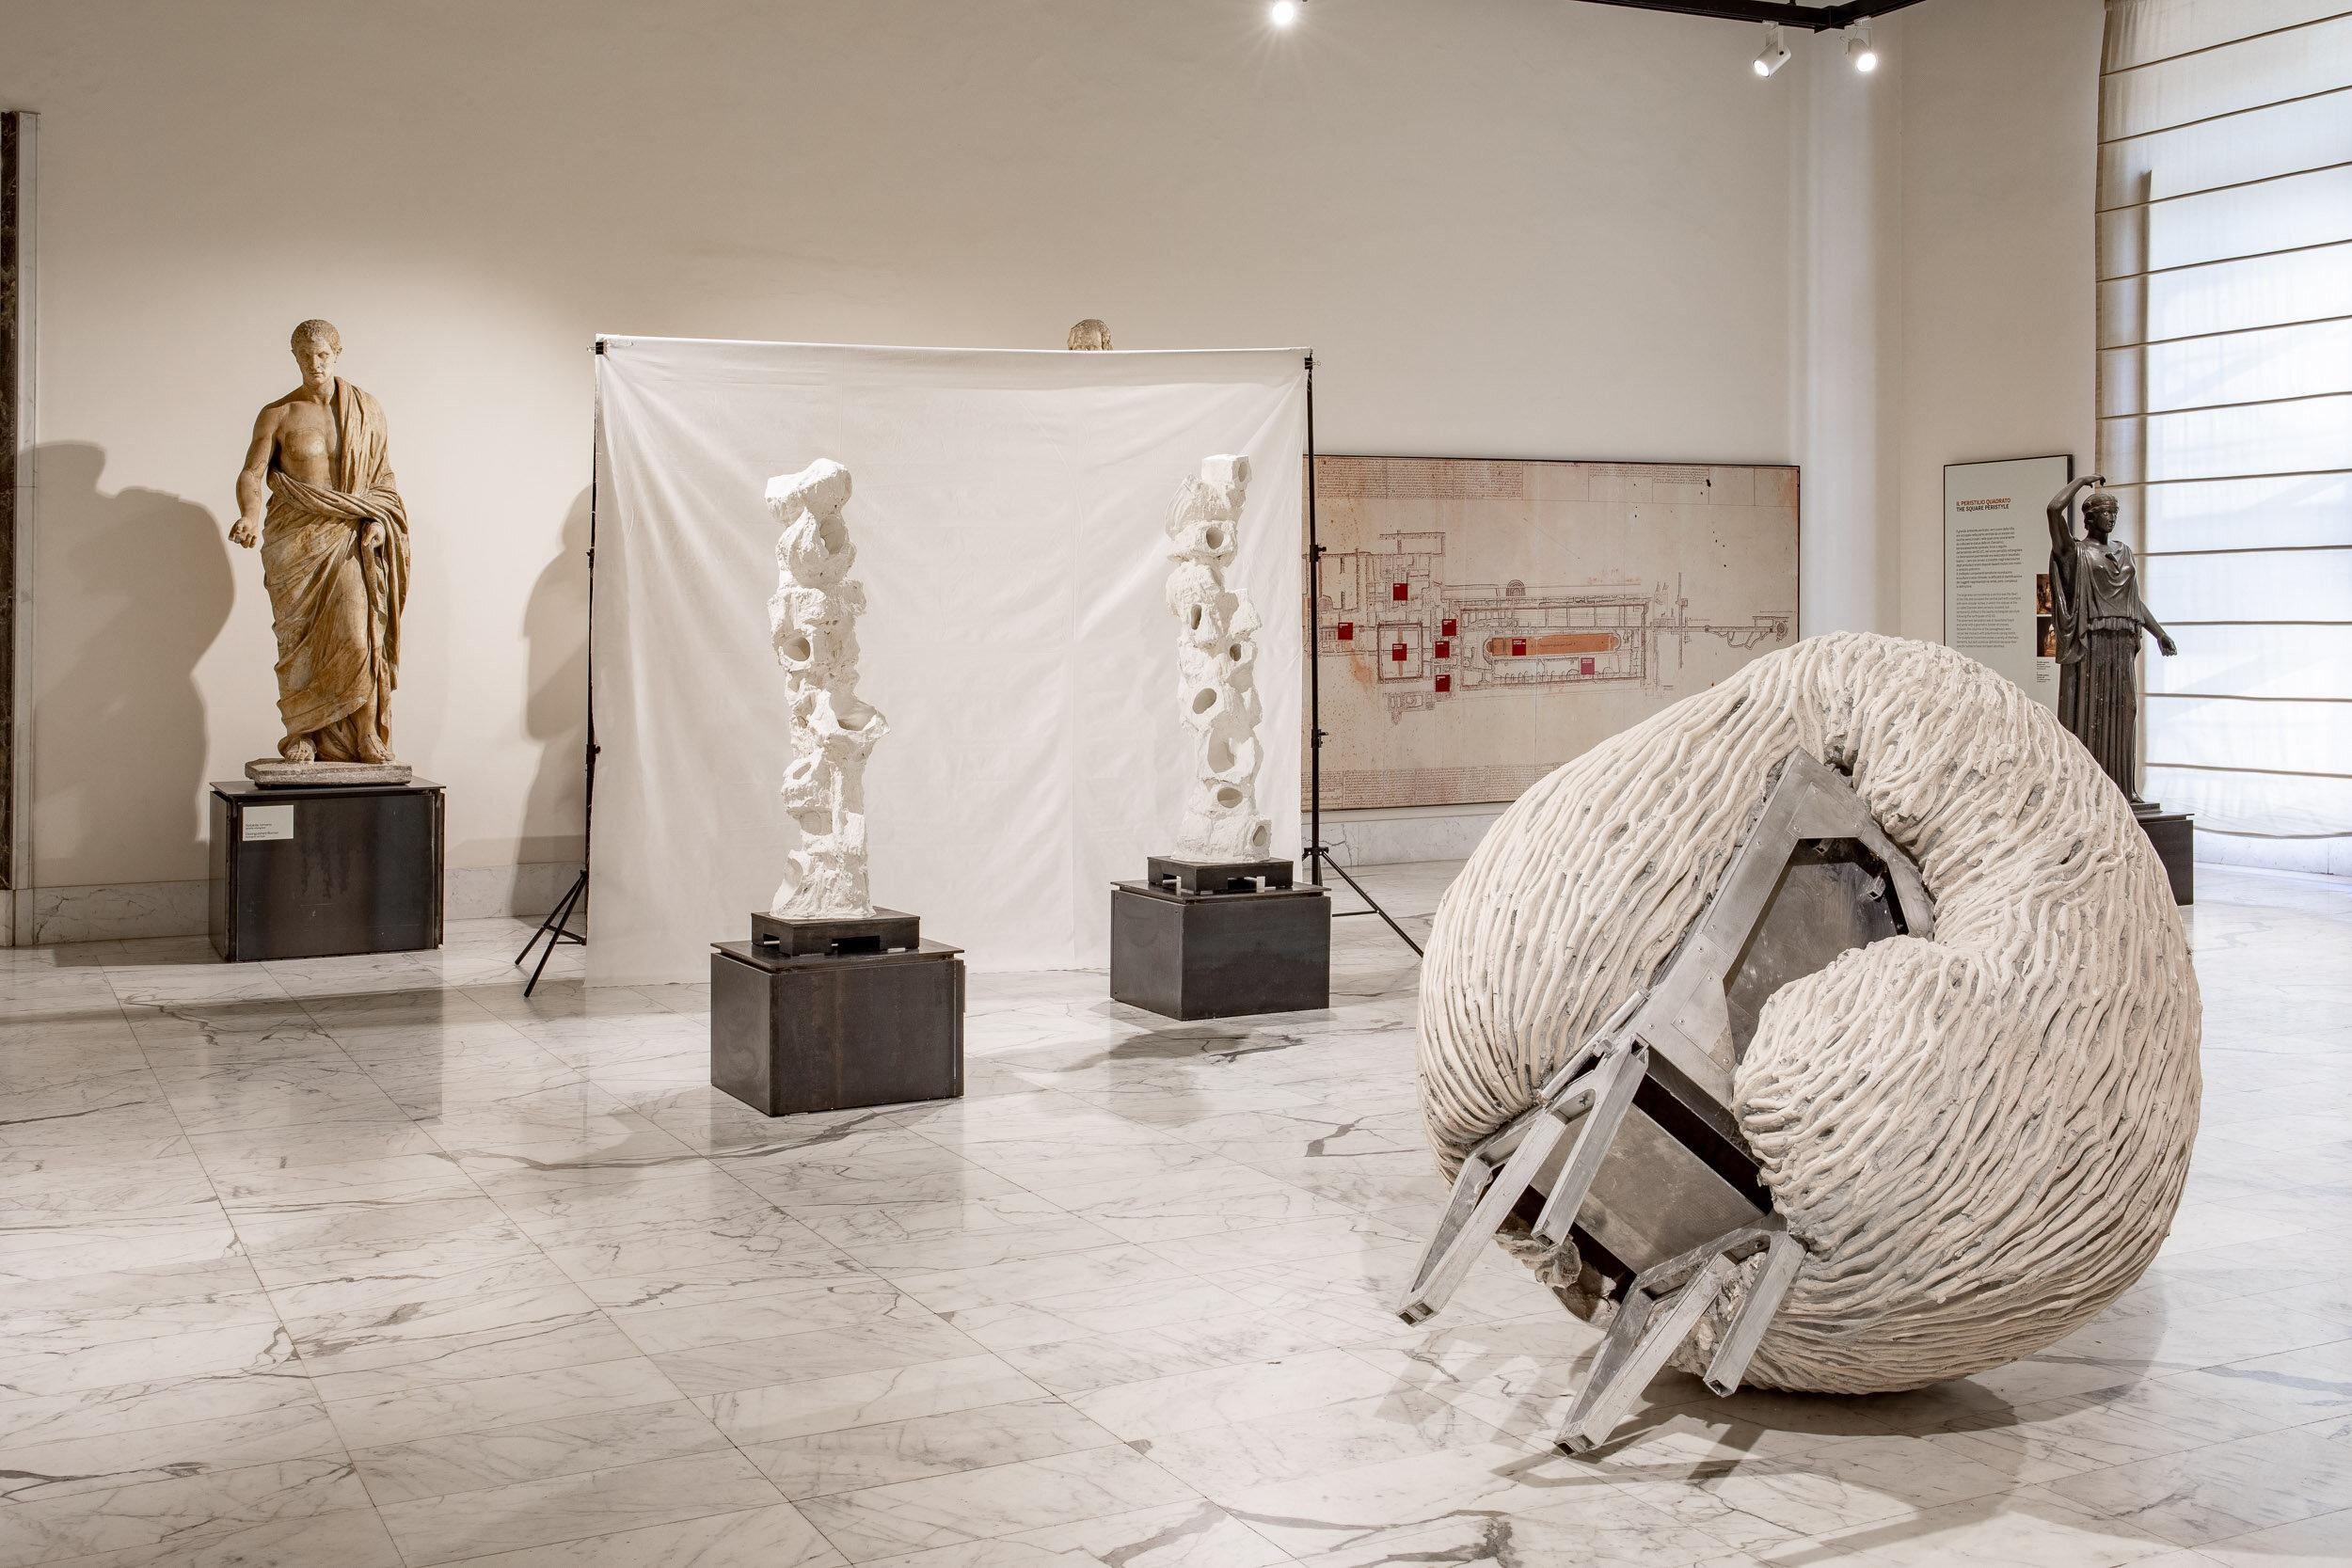 Anthropometry (installation view)  Aquaresin, aluminium, glass fiber, steel, pigment, clay  170 x 140 x 130 cm  2019